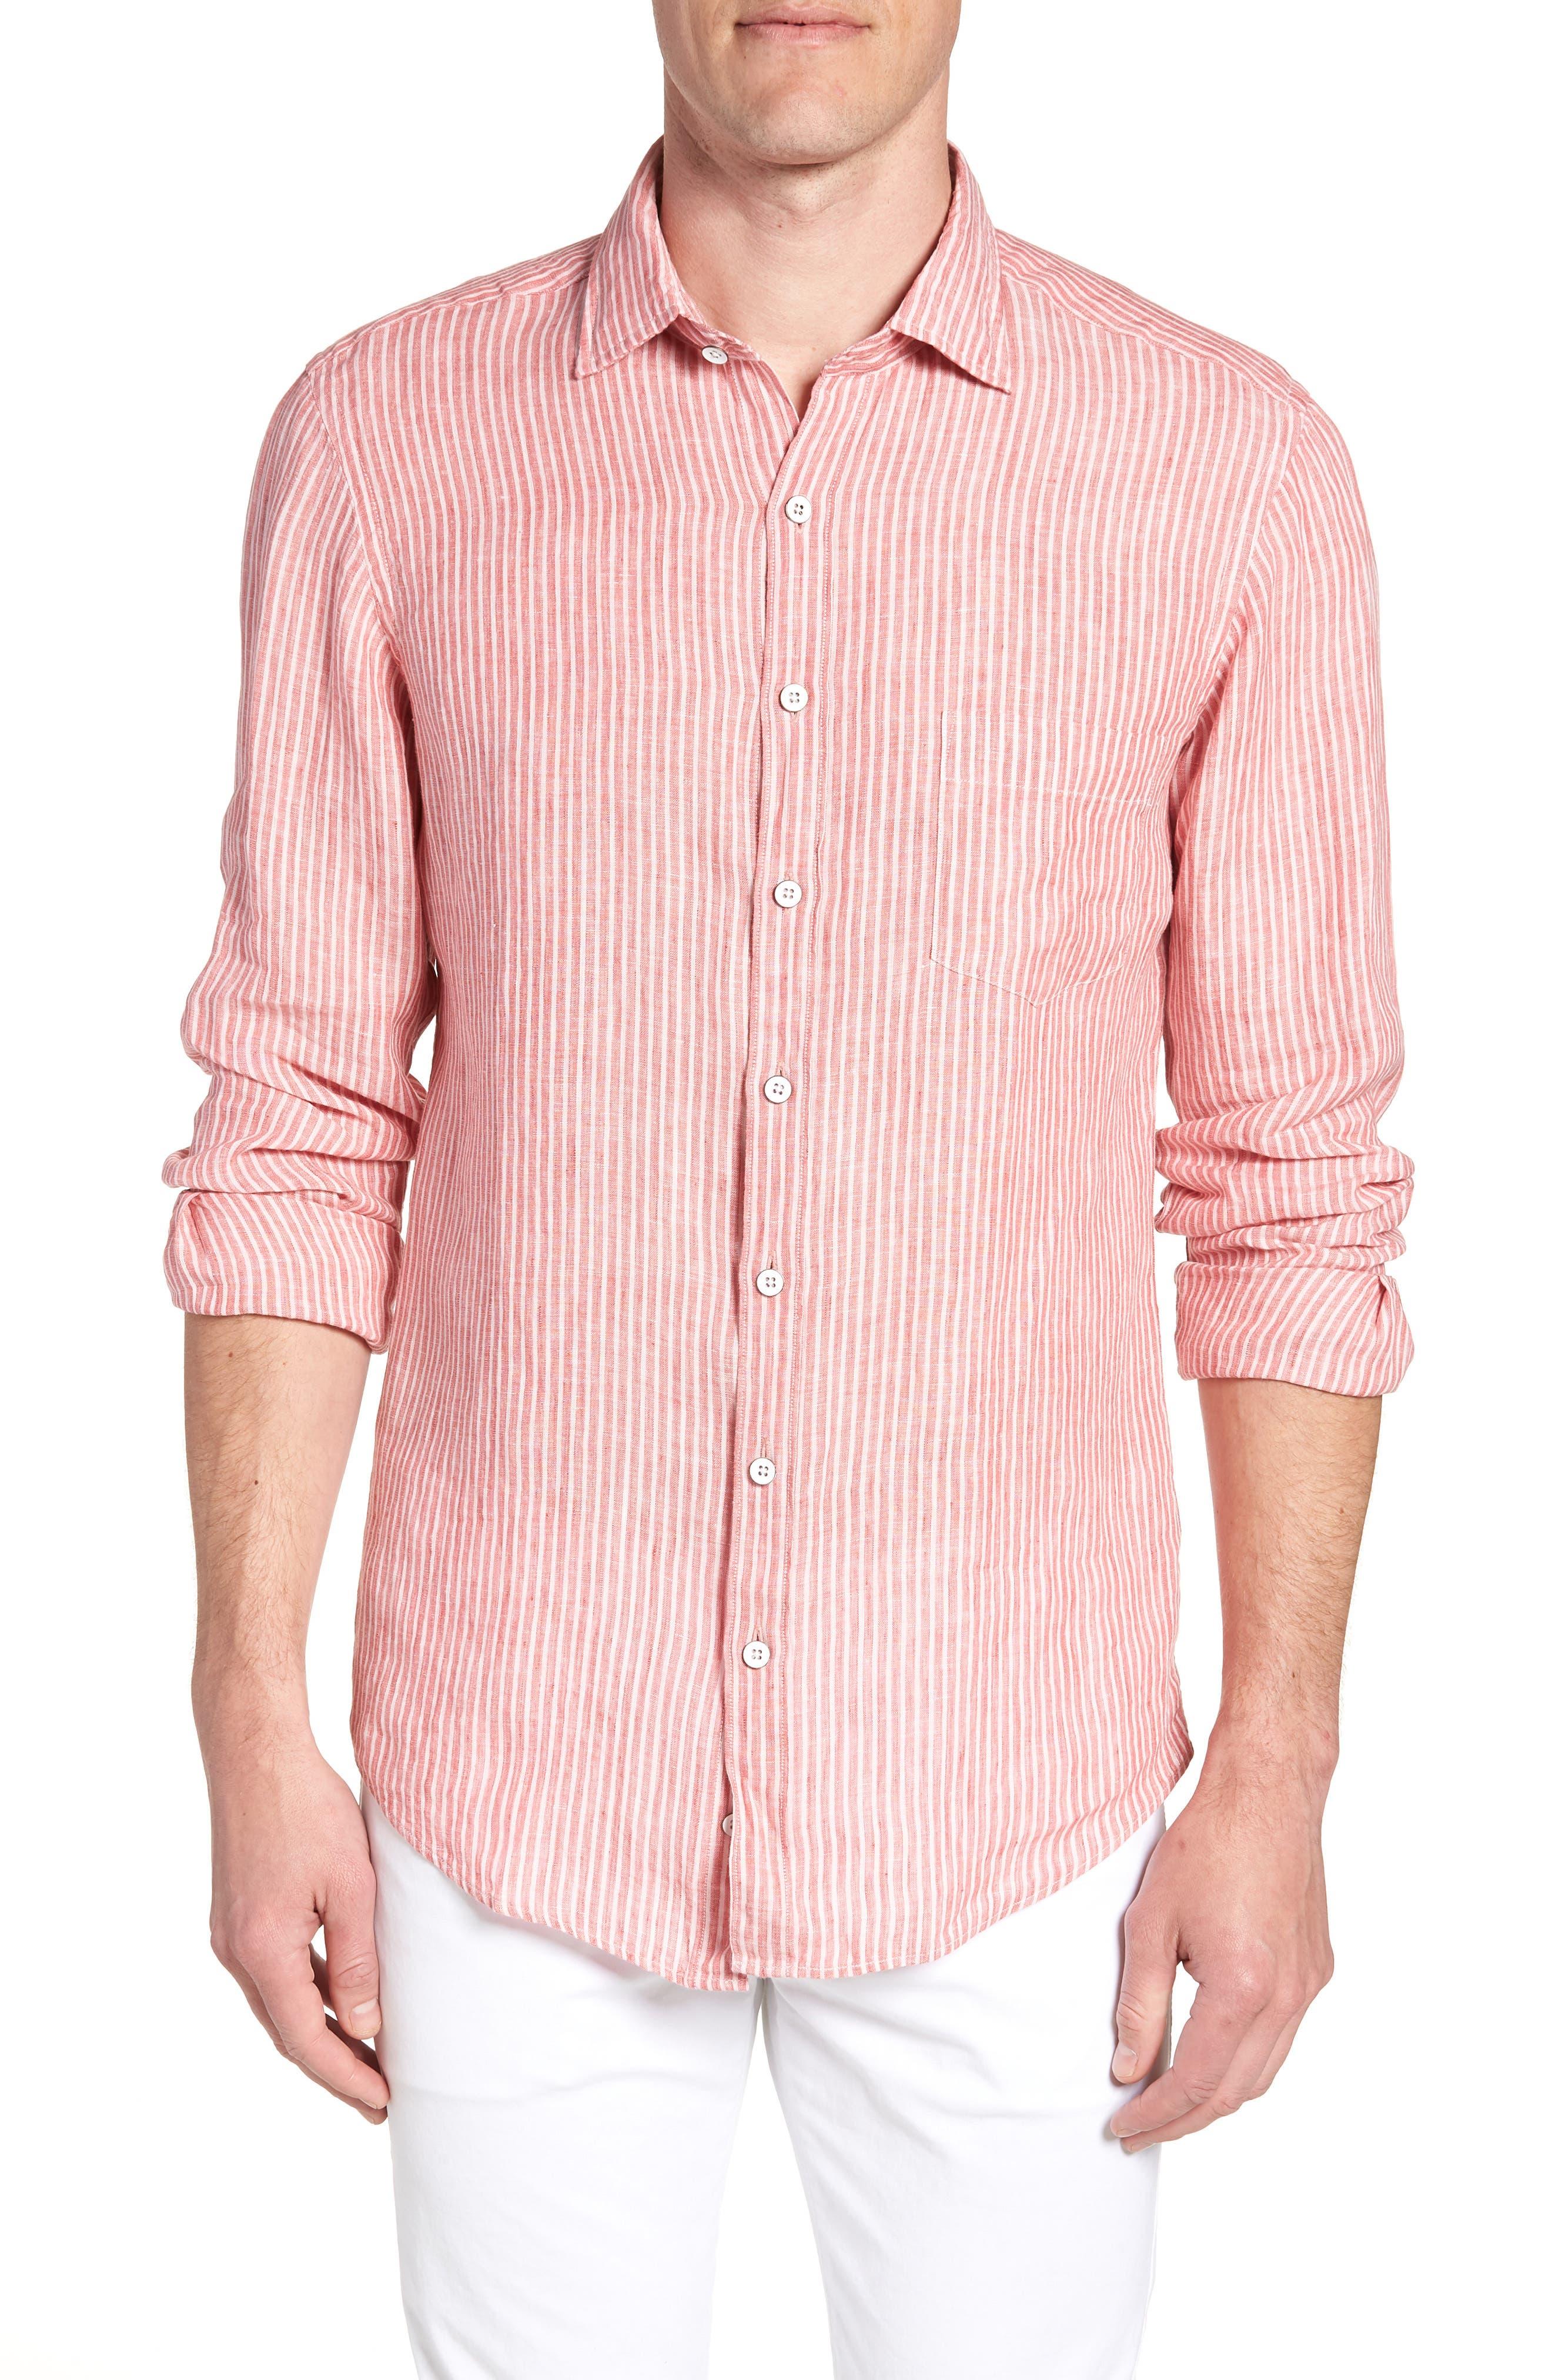 Warwick Junction Stripe Linen Sport Shirt,                             Main thumbnail 1, color,                             Coral